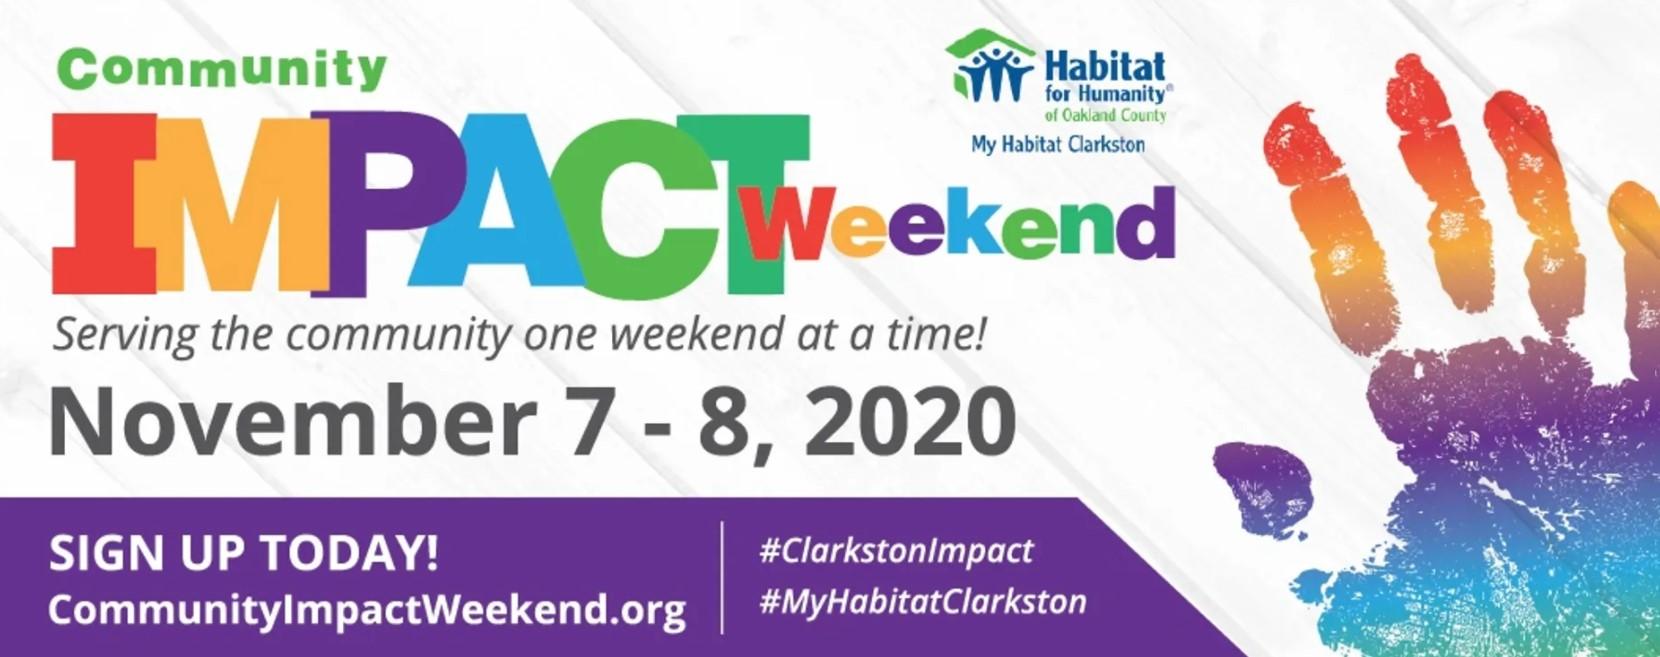 My Habitat Clarkston Community Impact Weekend